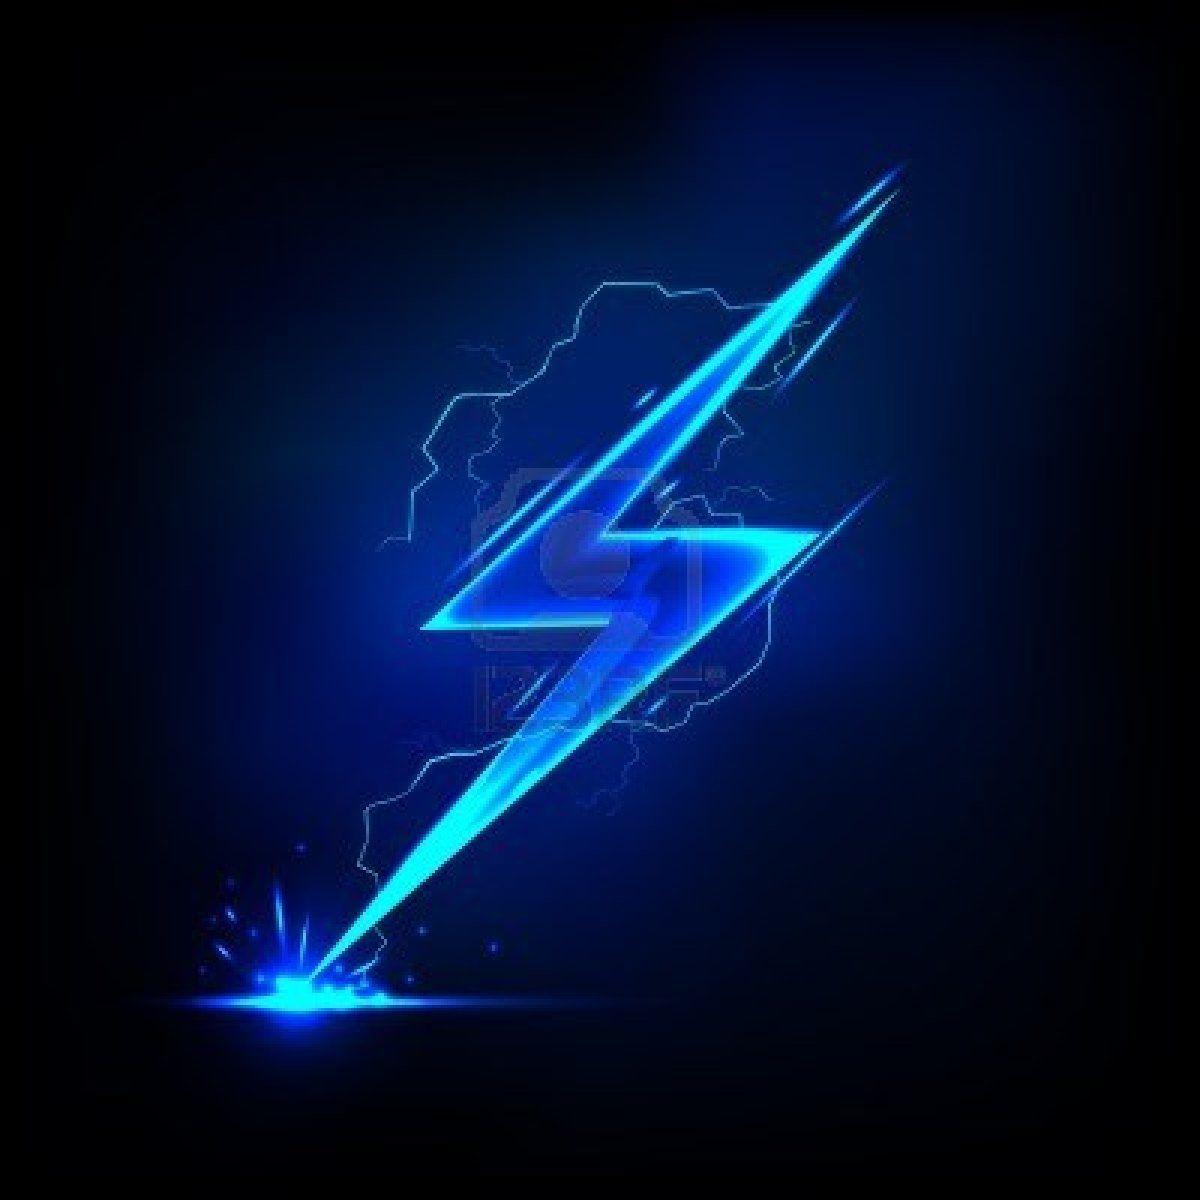 Lightening clipart neon Png Best Lighting Bolt org